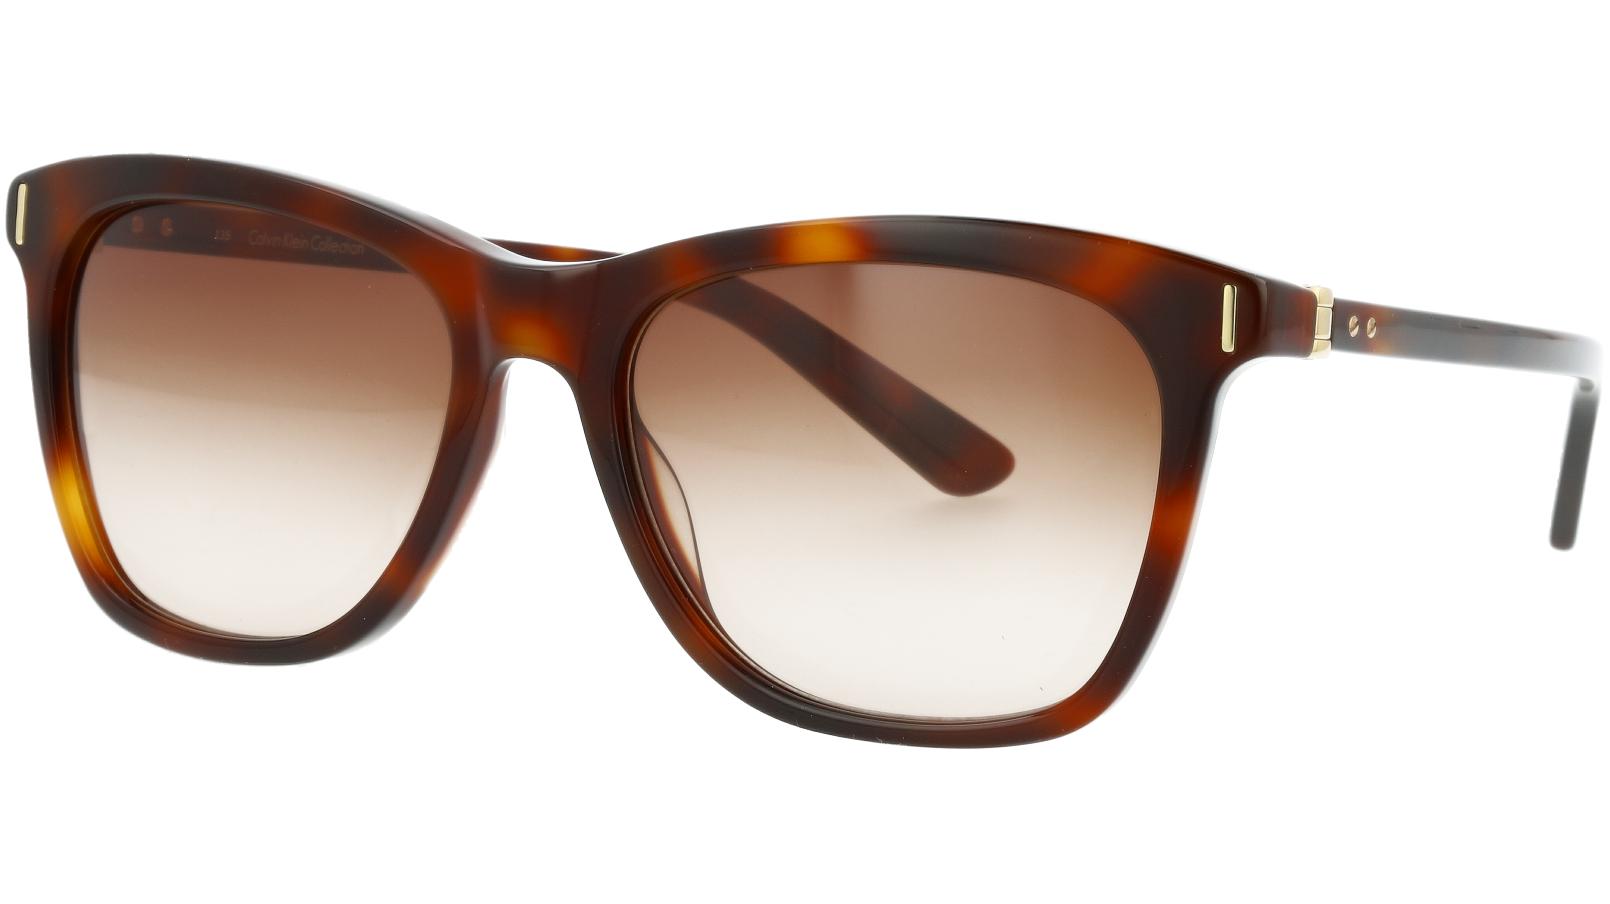 CALVIN KLEIN CK8510S 218 55 TORTOISE Sunglasses